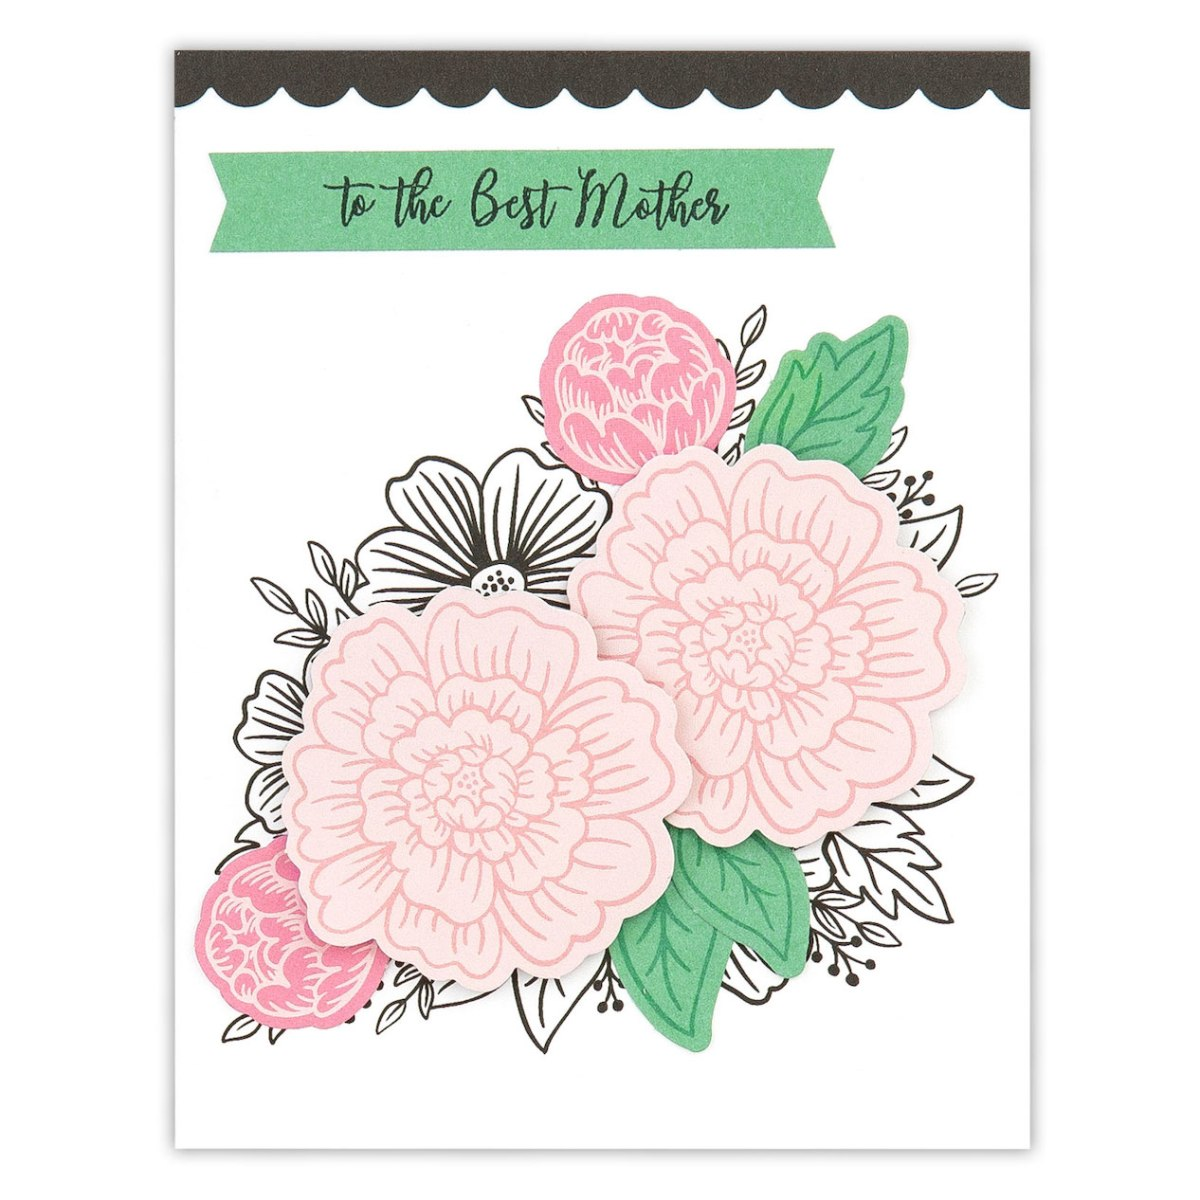 Easy DIY Cards #ctmh #closetomyheart #craftwithheart #cardmaking #diy #subscription #papercrafting #crafting #birthday #thanks #shakerwindow